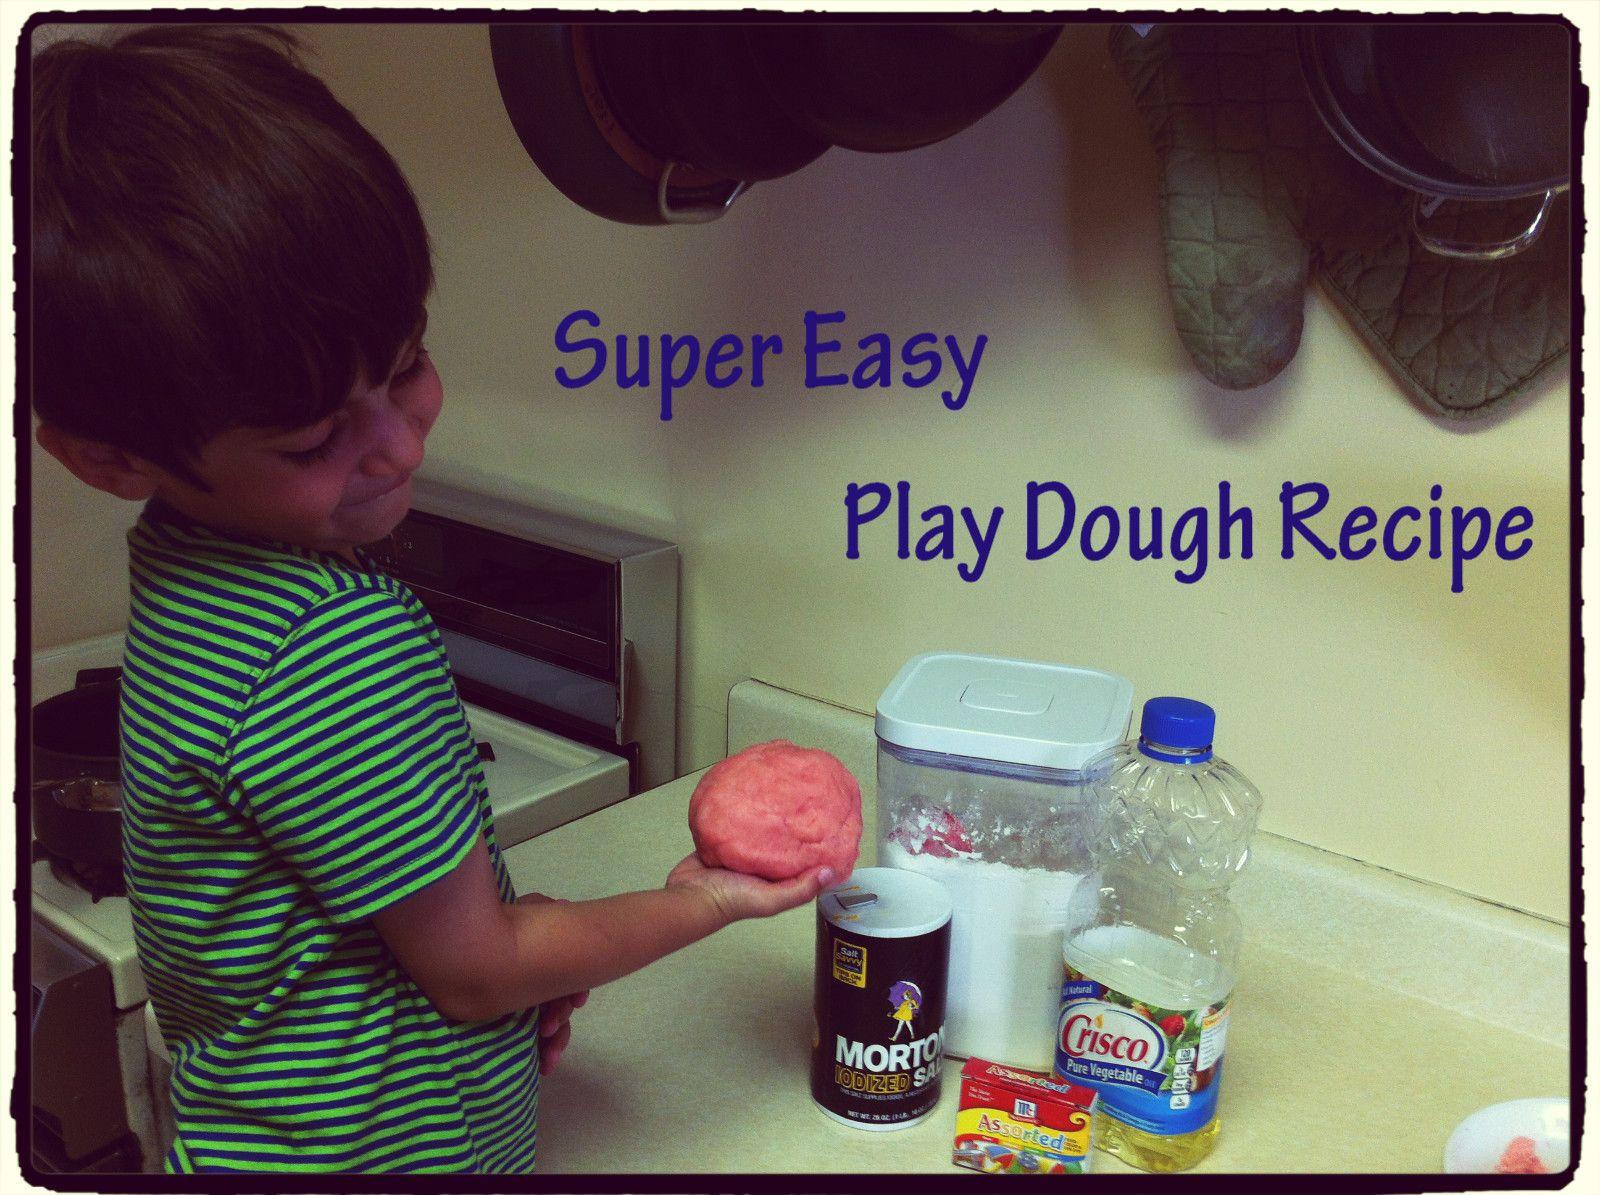 Super Easy Play Dough Recipe Flour, Salt, Oil & Water